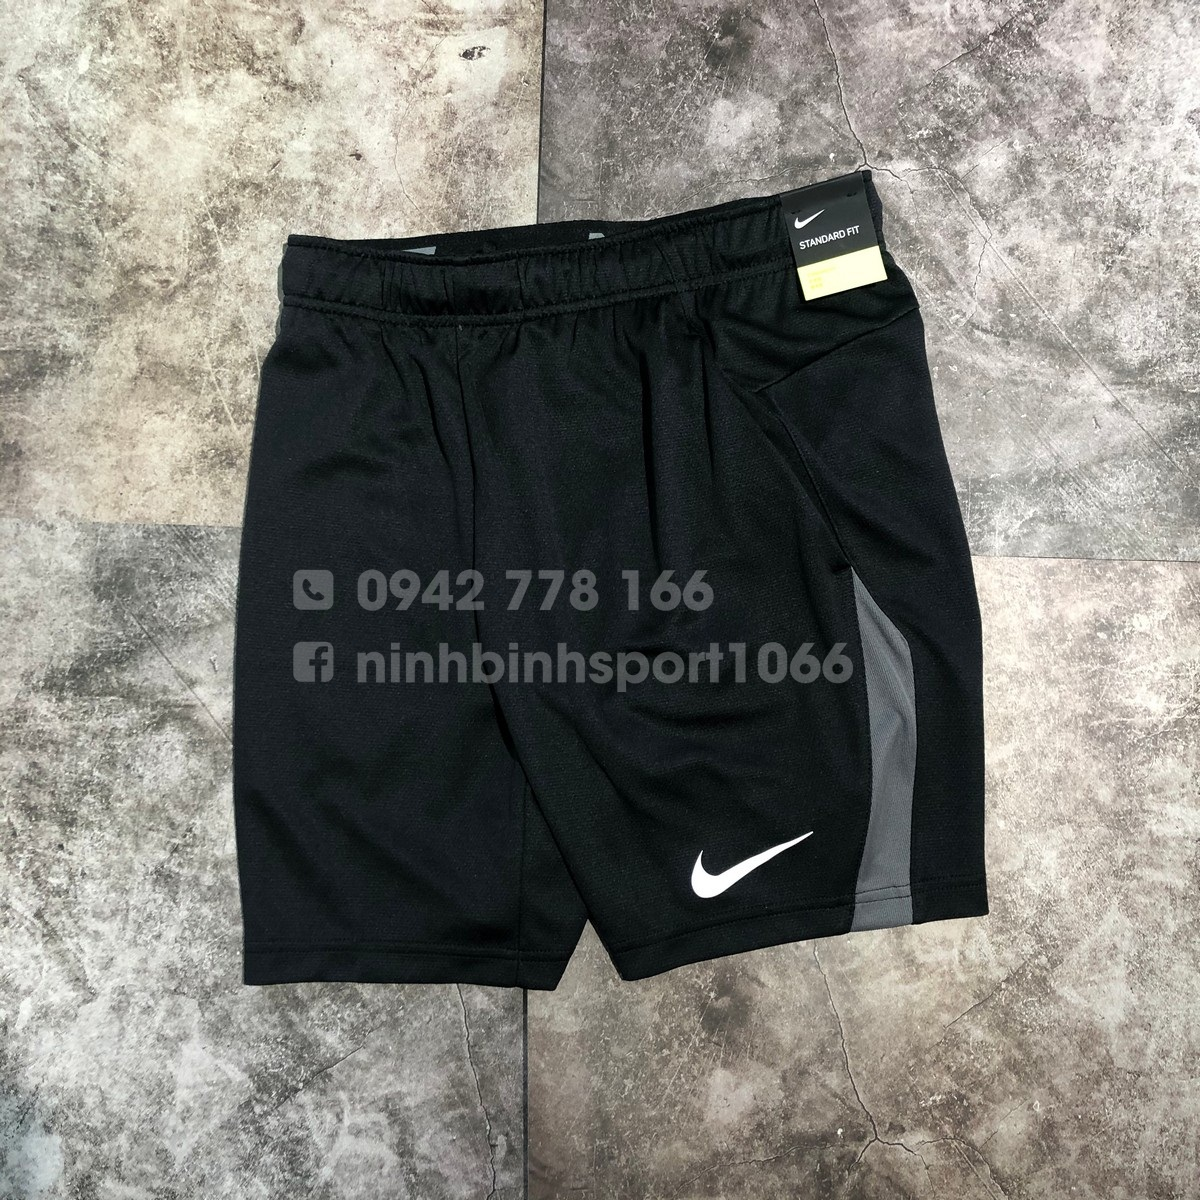 Quần short thể thao nam Nike Dri-FIT CJ2008-010